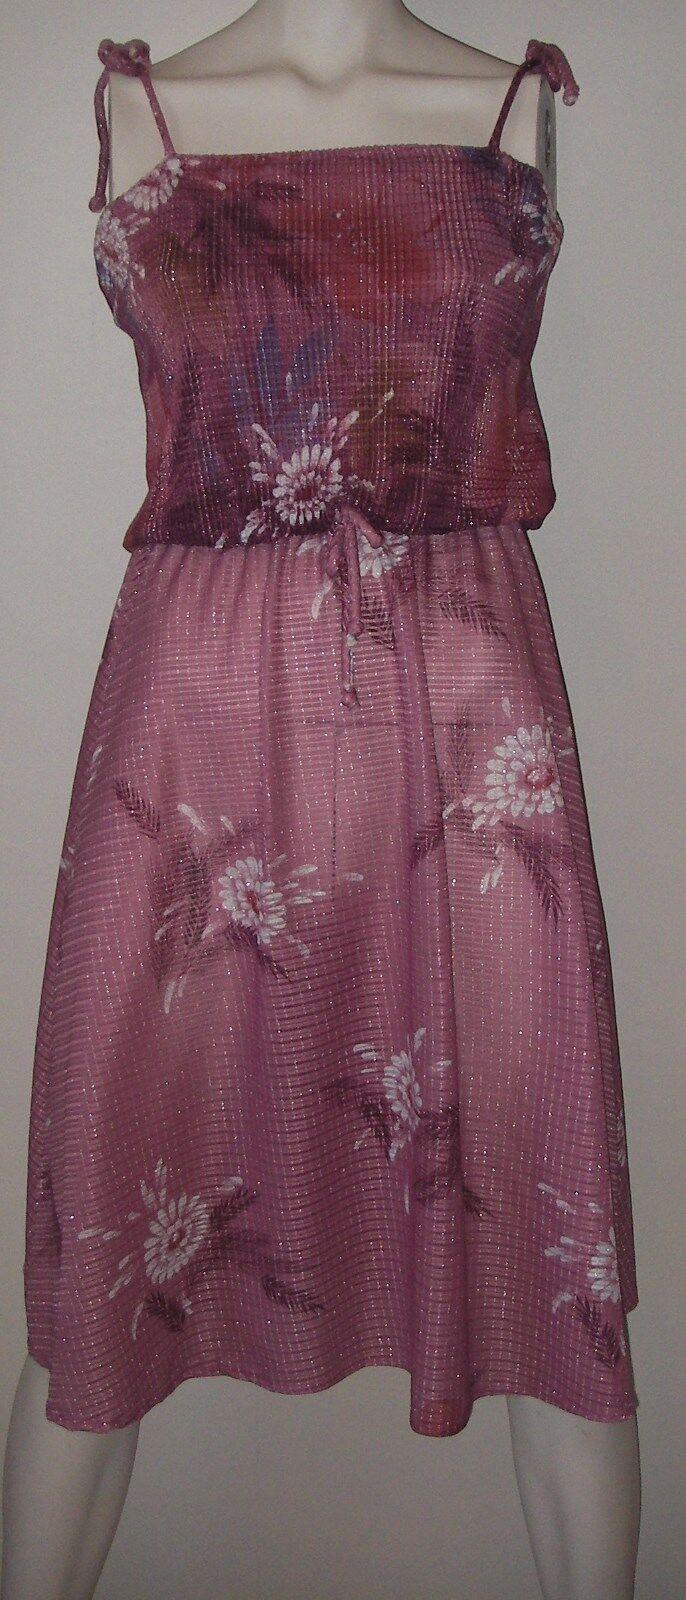 Vintage 70s Womens Clothing DRESS Pink Disco Spaghetti Straps Draped Bodice